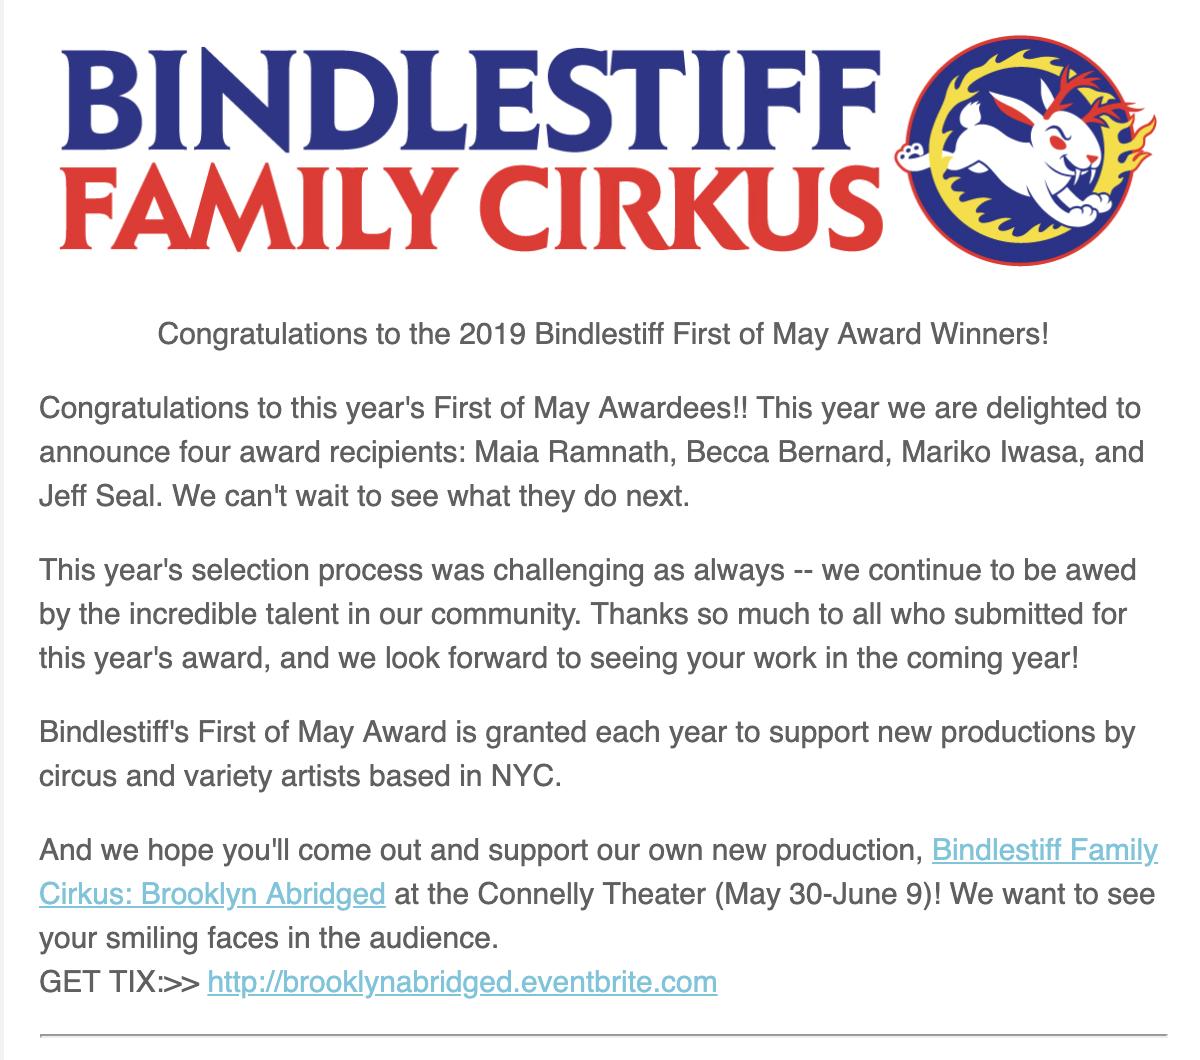 Bindlestiff Family Cirkus First of May Award